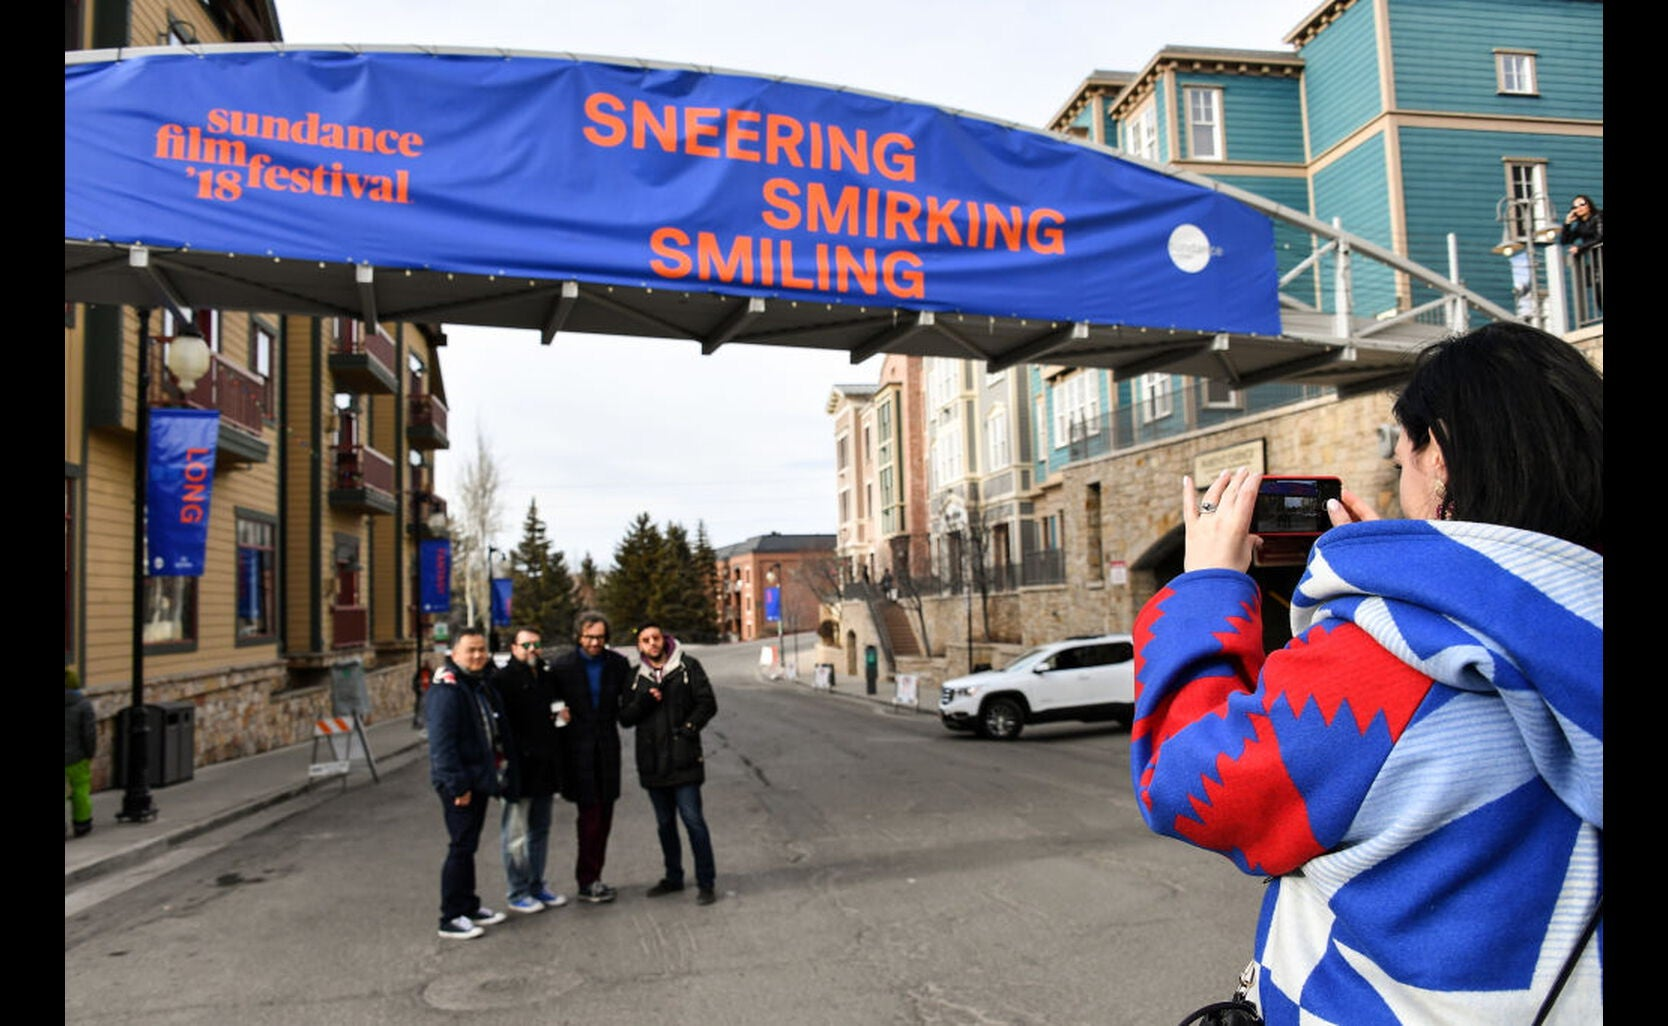 Sundance 2018 street ambiance